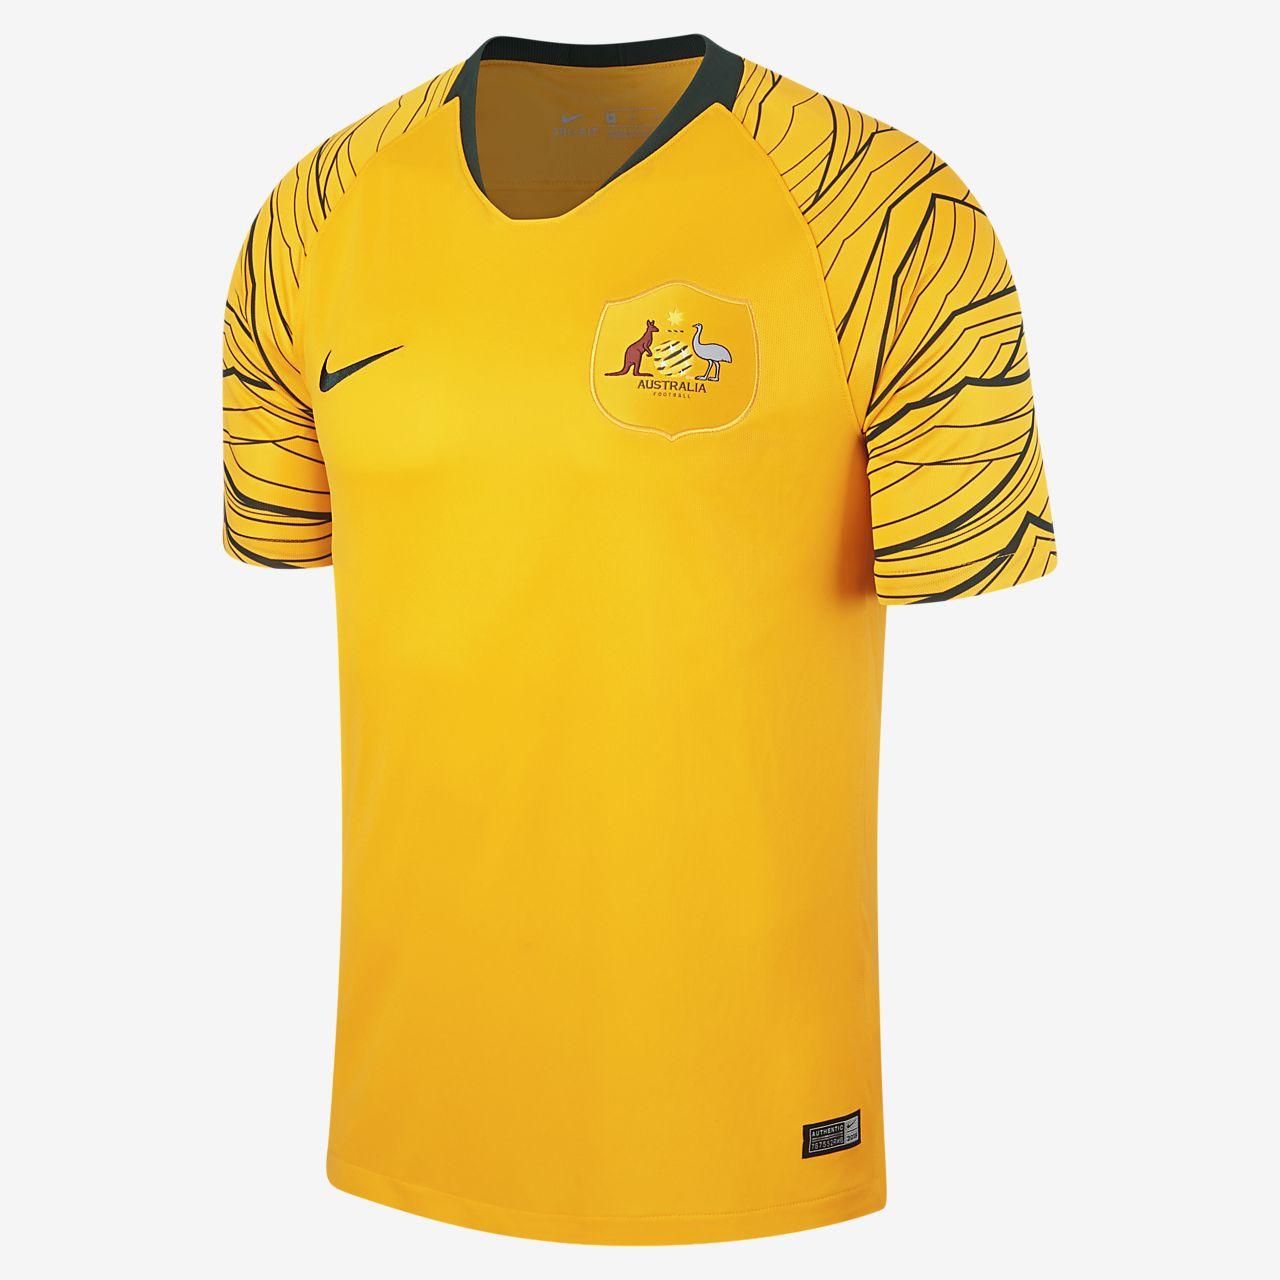 Maglia da calcio 2018 Australia Stadium Home - Uomo